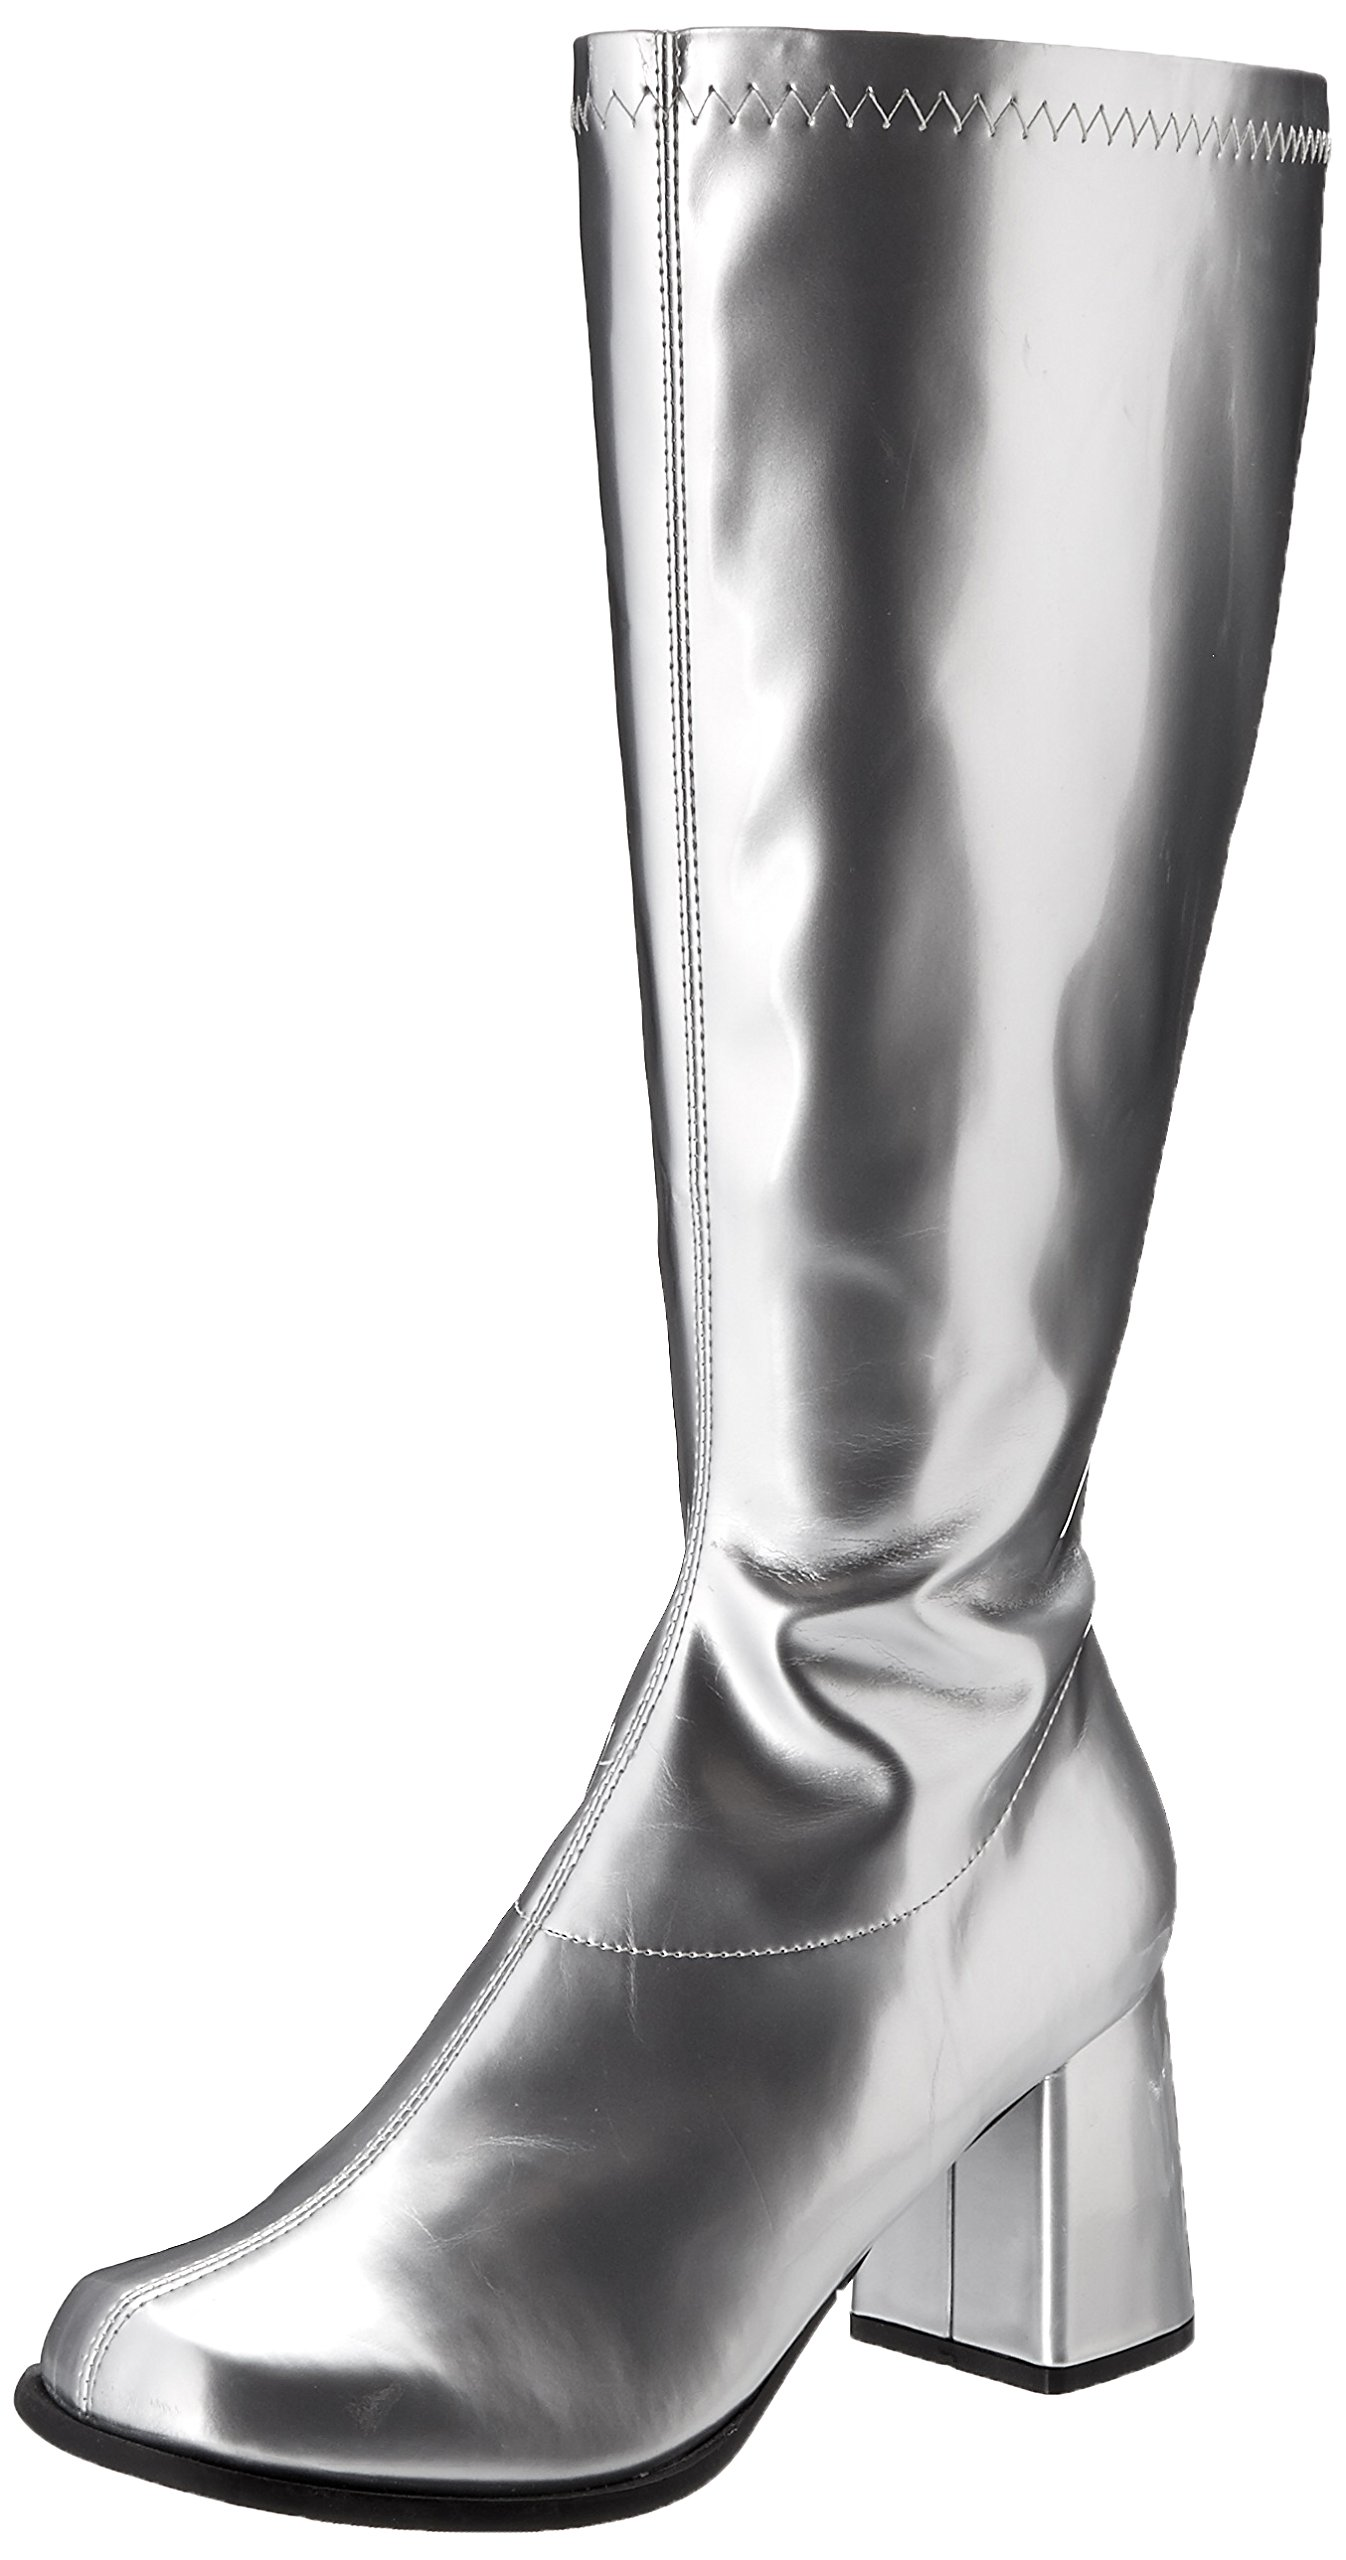 Ellie Shoes Women's Gogo Boot, Silver, 11 M US